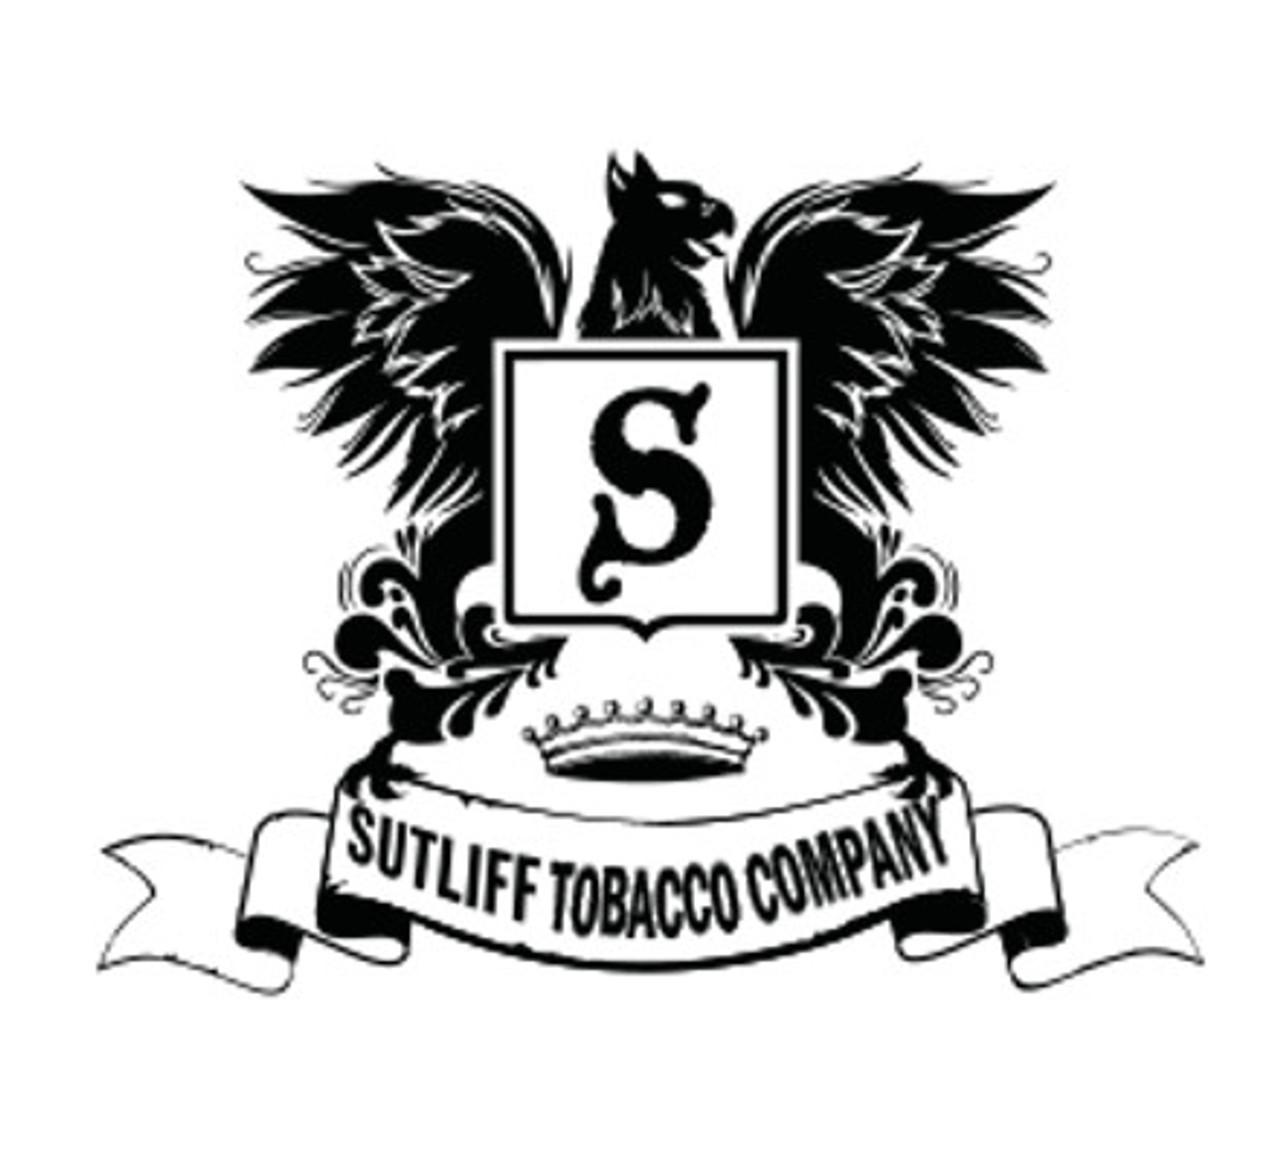 Sutliff 310 Modern English Bulk Pipe Tobacco 5 LB